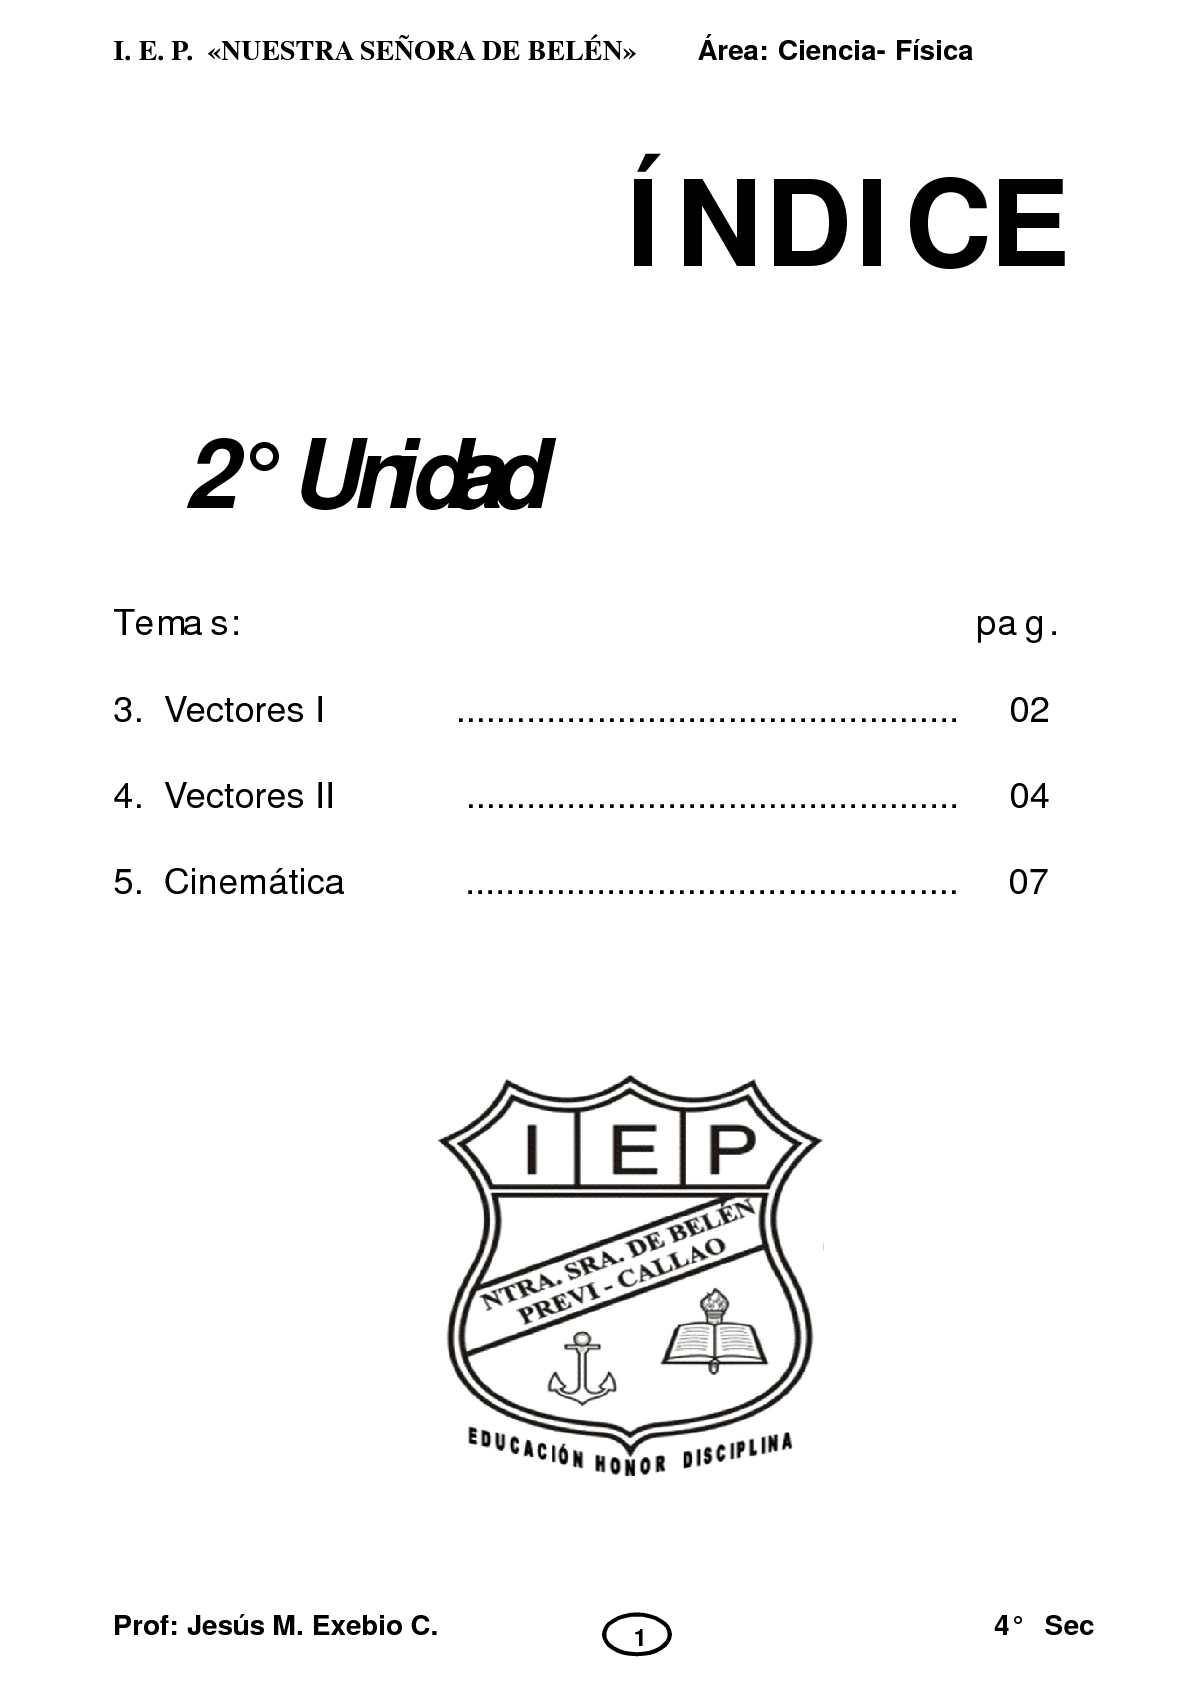 TEORIA FISICA 4 SEC 2 UNIDAD